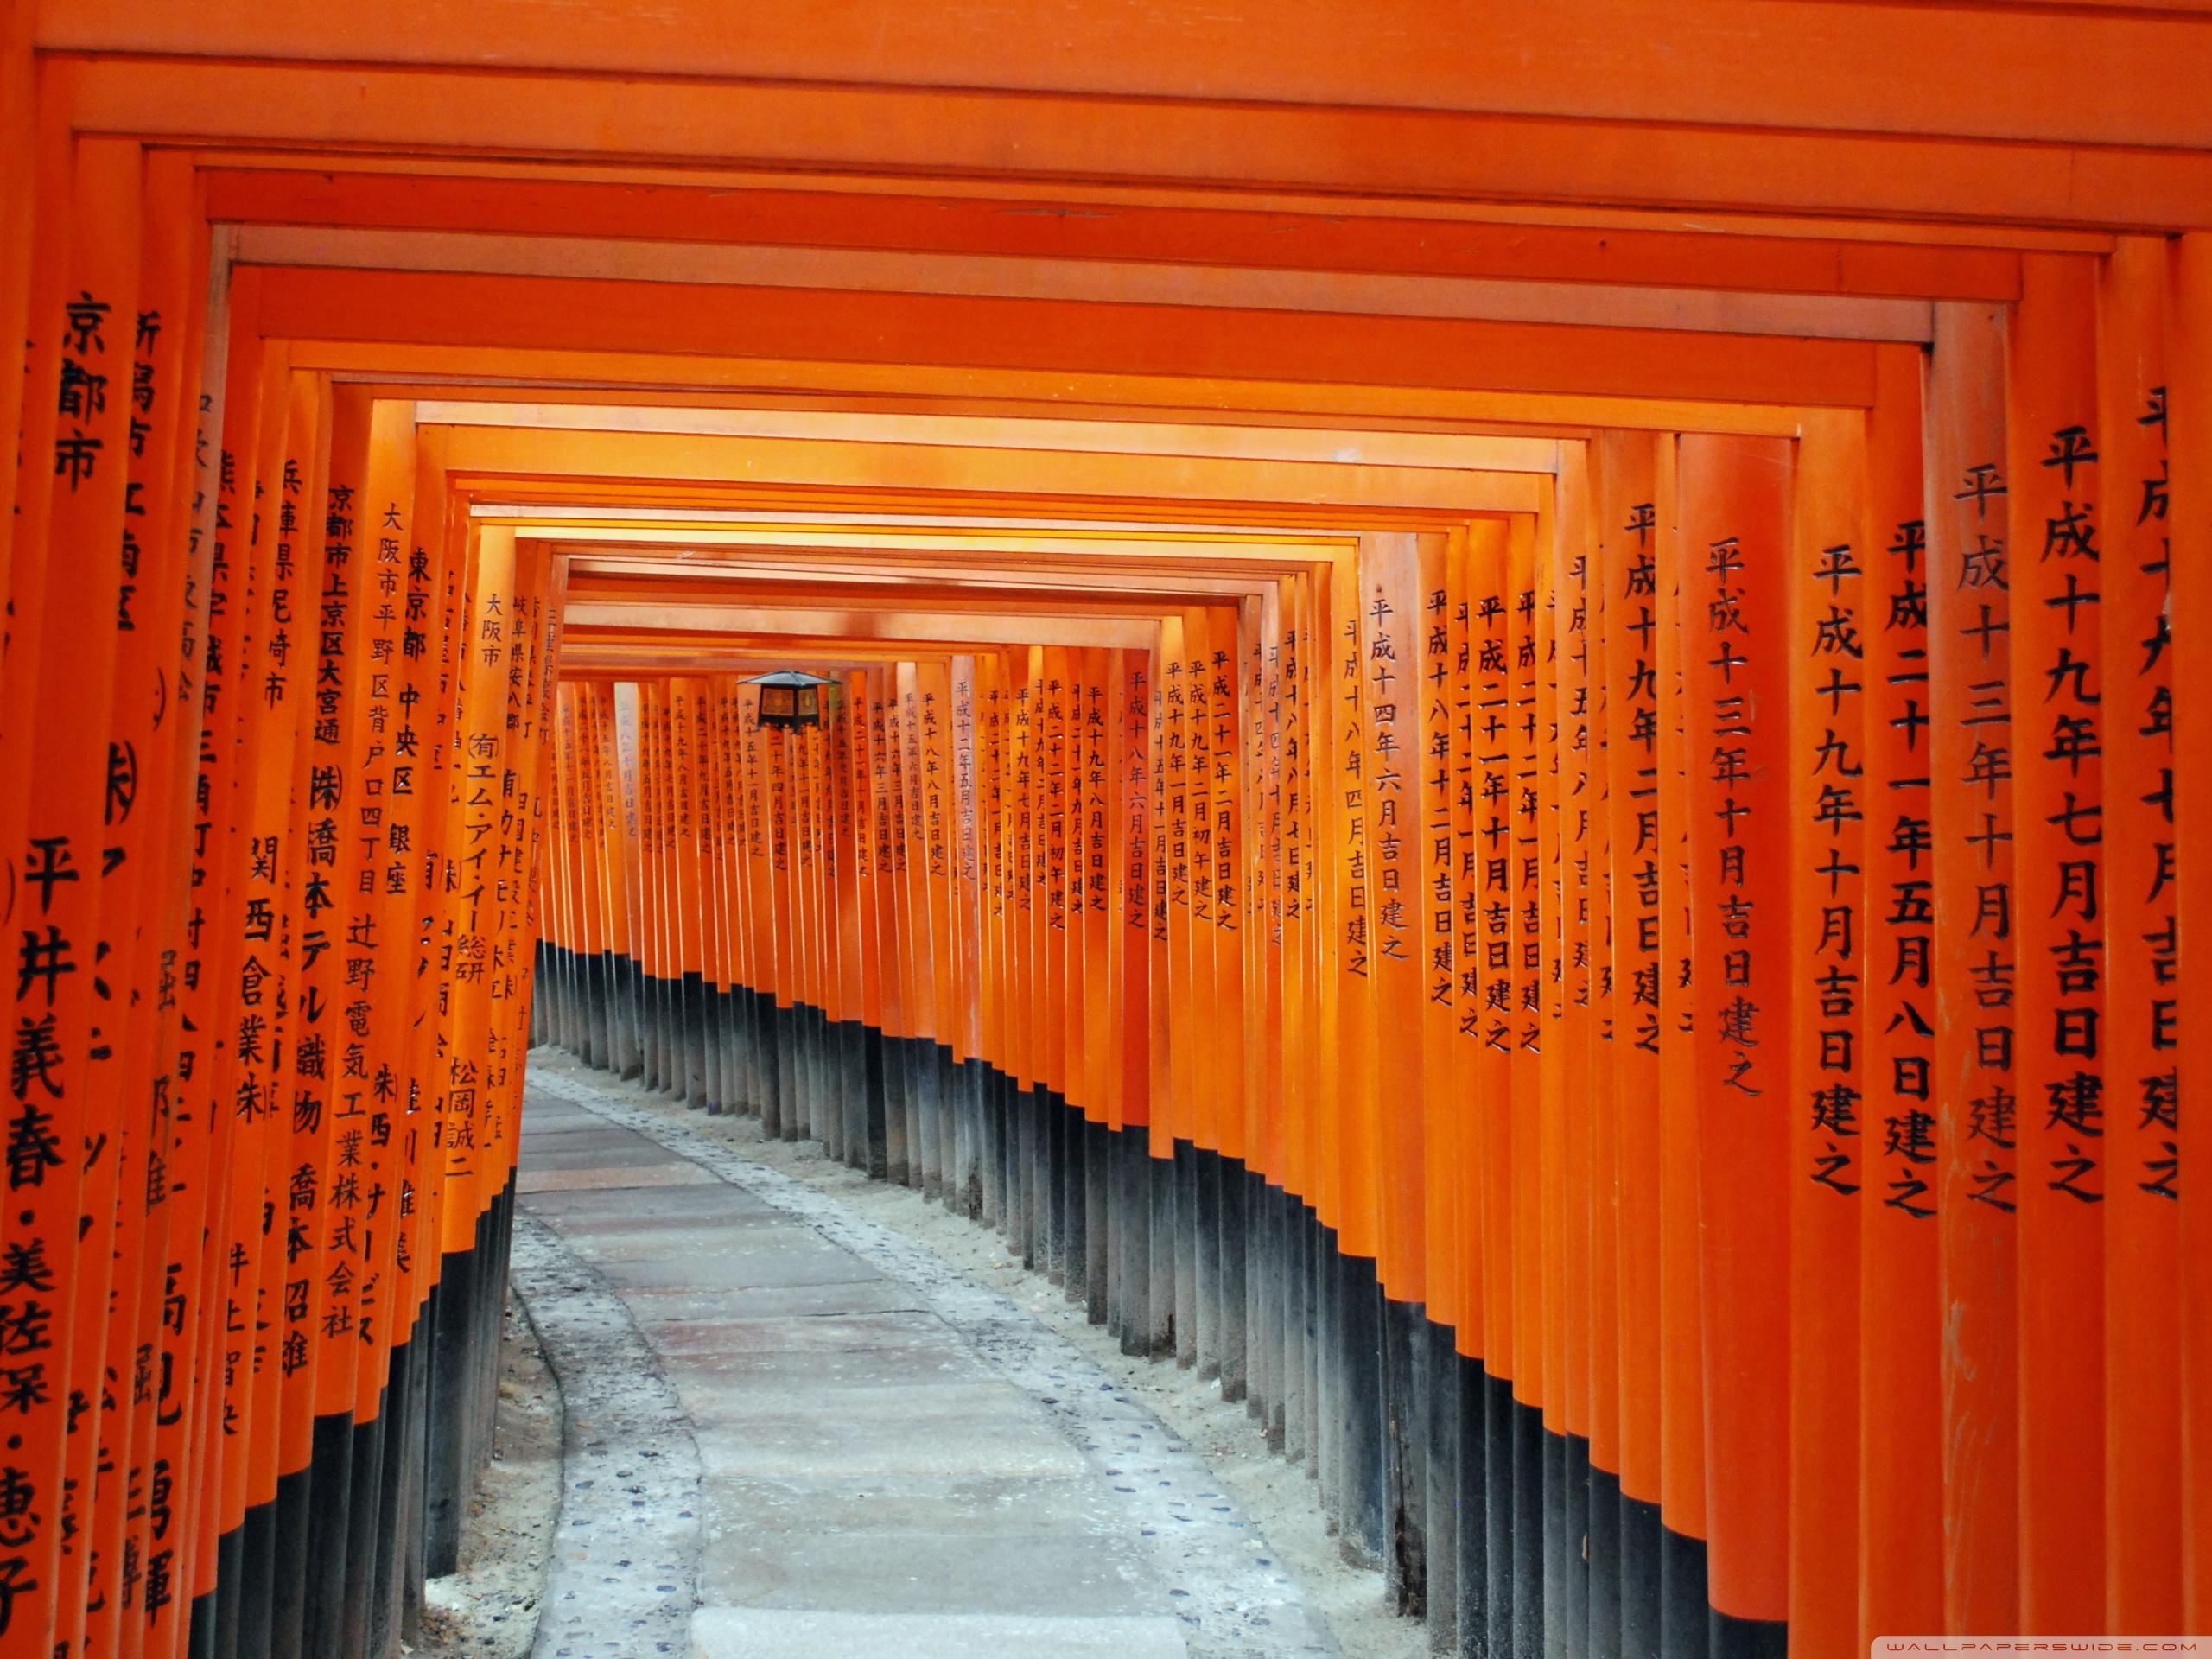 Fushimi Inari Taisha Kyoto Japan 4K HD Desktop Wallpaper for 2560x1920